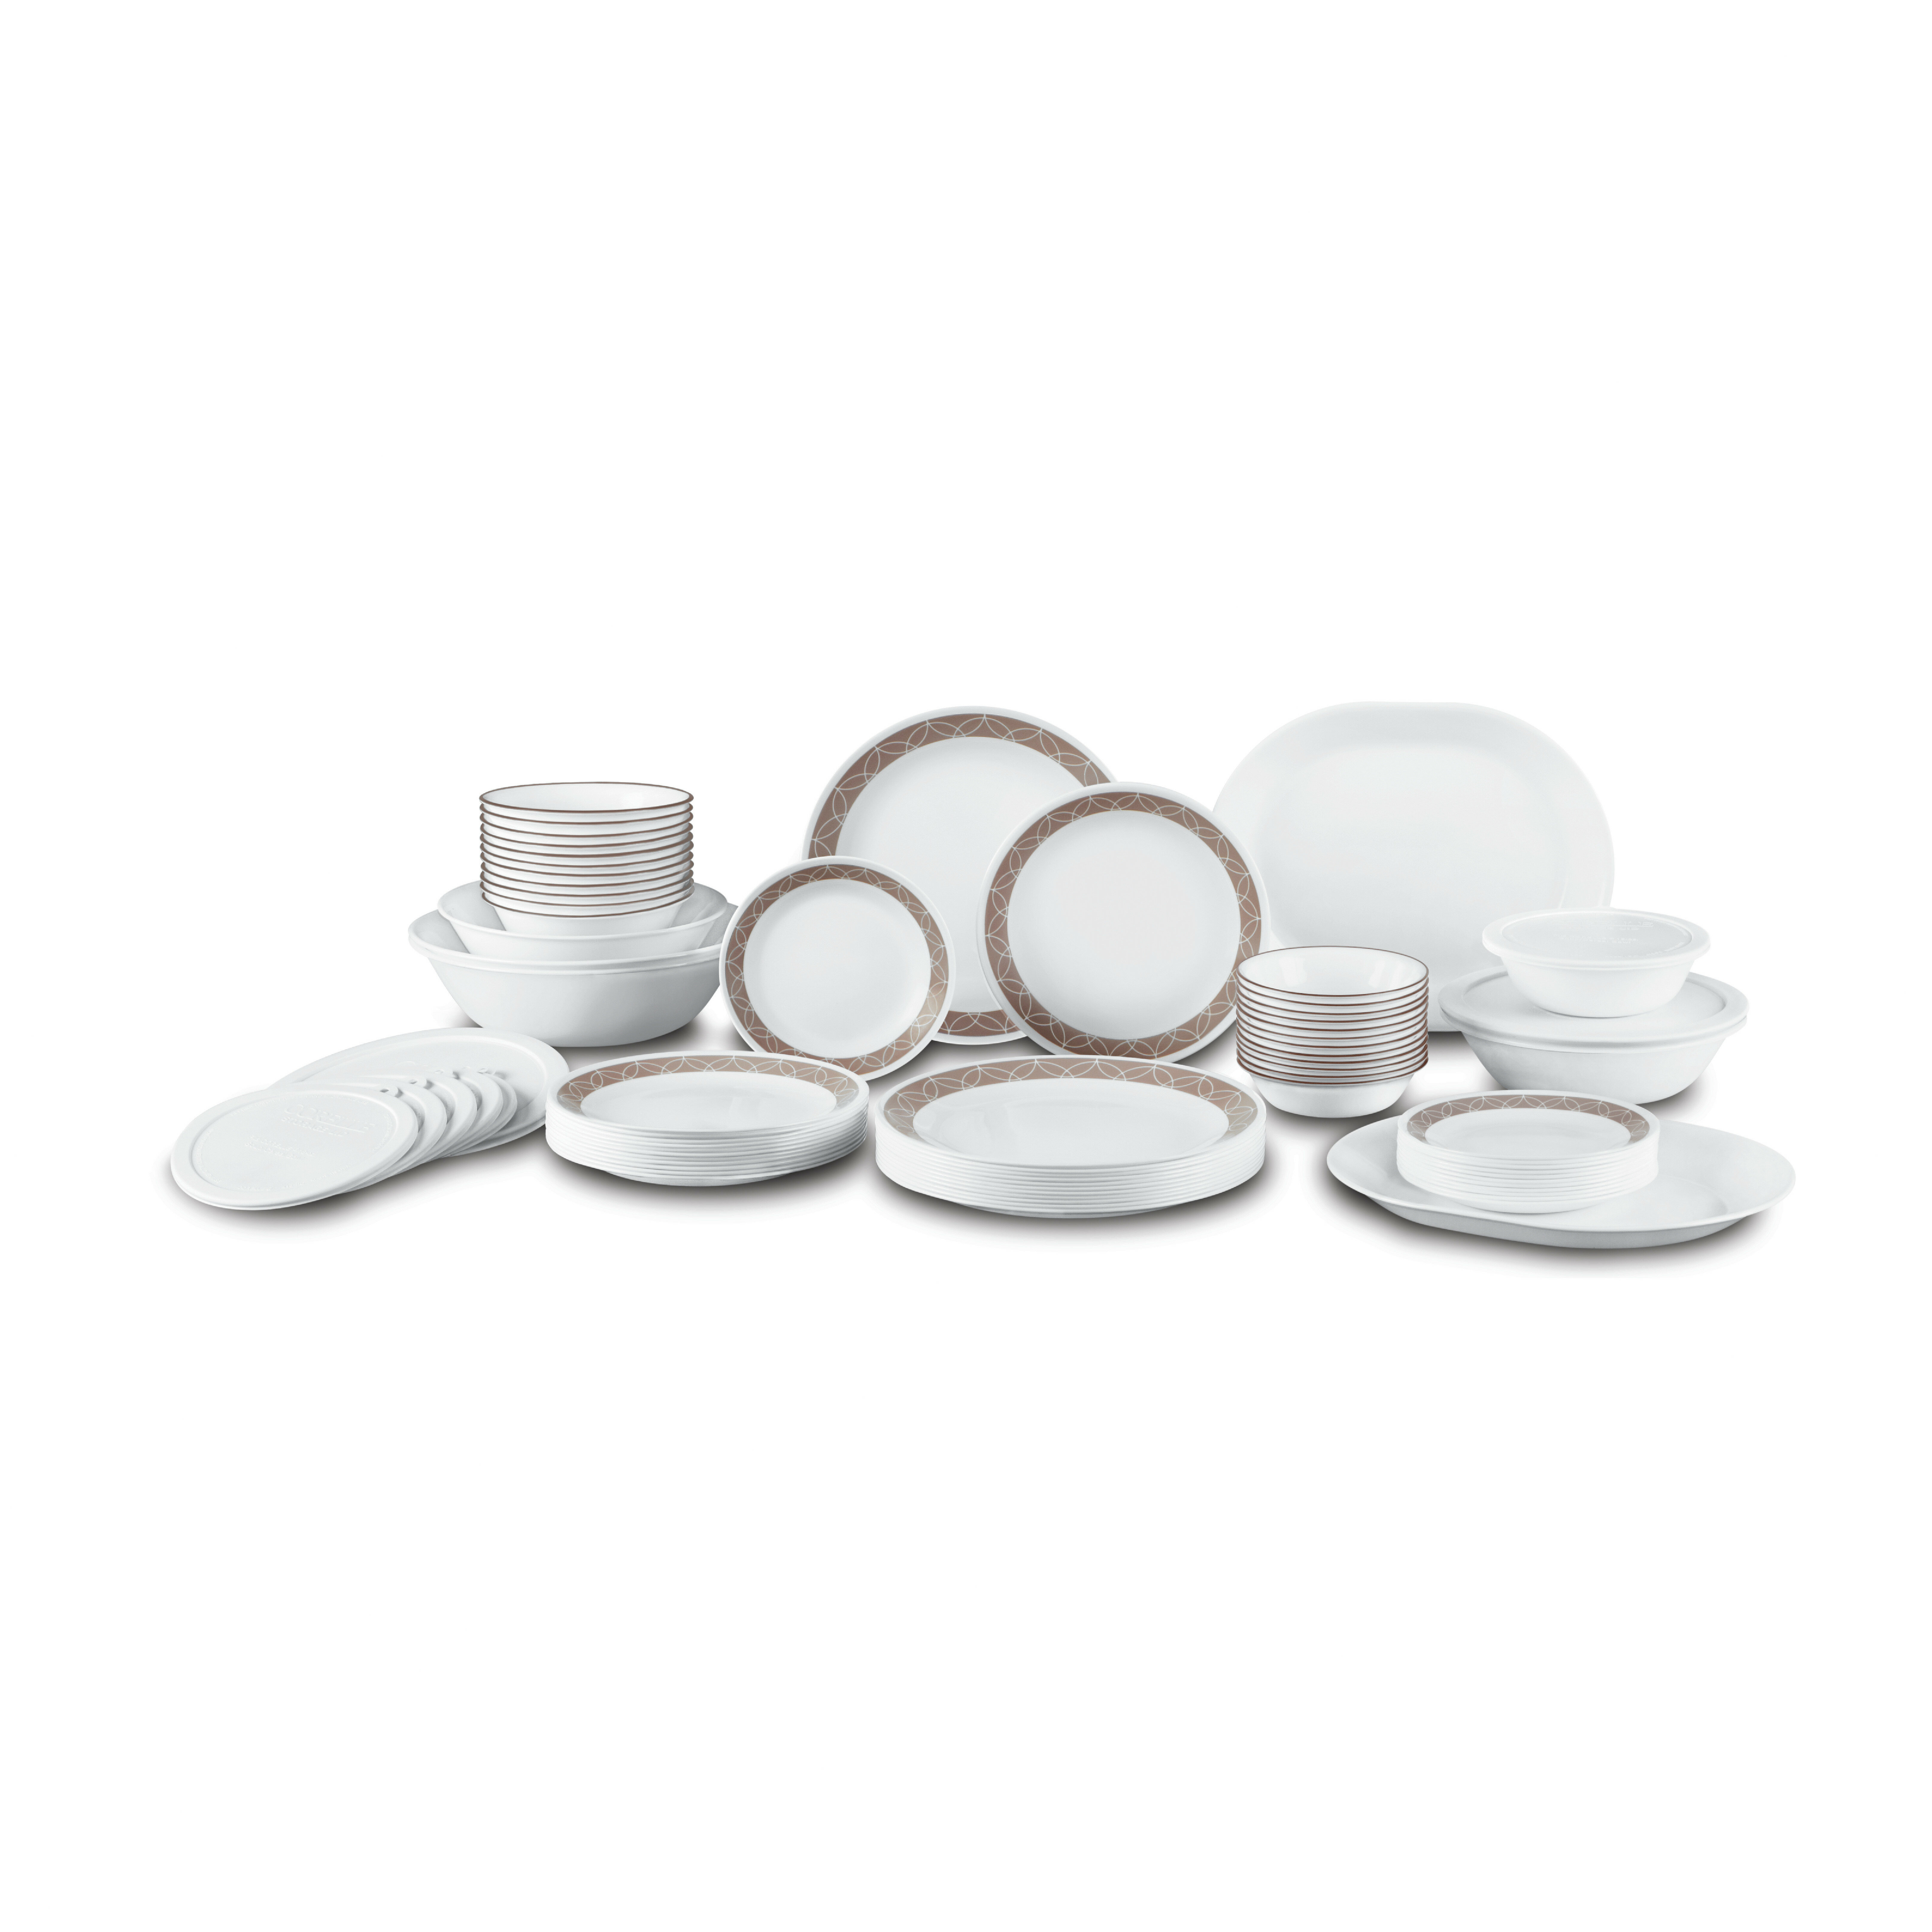 Corelle Sand Sketch Living Ware 74 Piece Dinnerware Set Service for 12 u0026 Reviews | Wayfair  sc 1 st  Wayfair & Corelle Sand Sketch Living Ware 74 Piece Dinnerware Set Service for ...